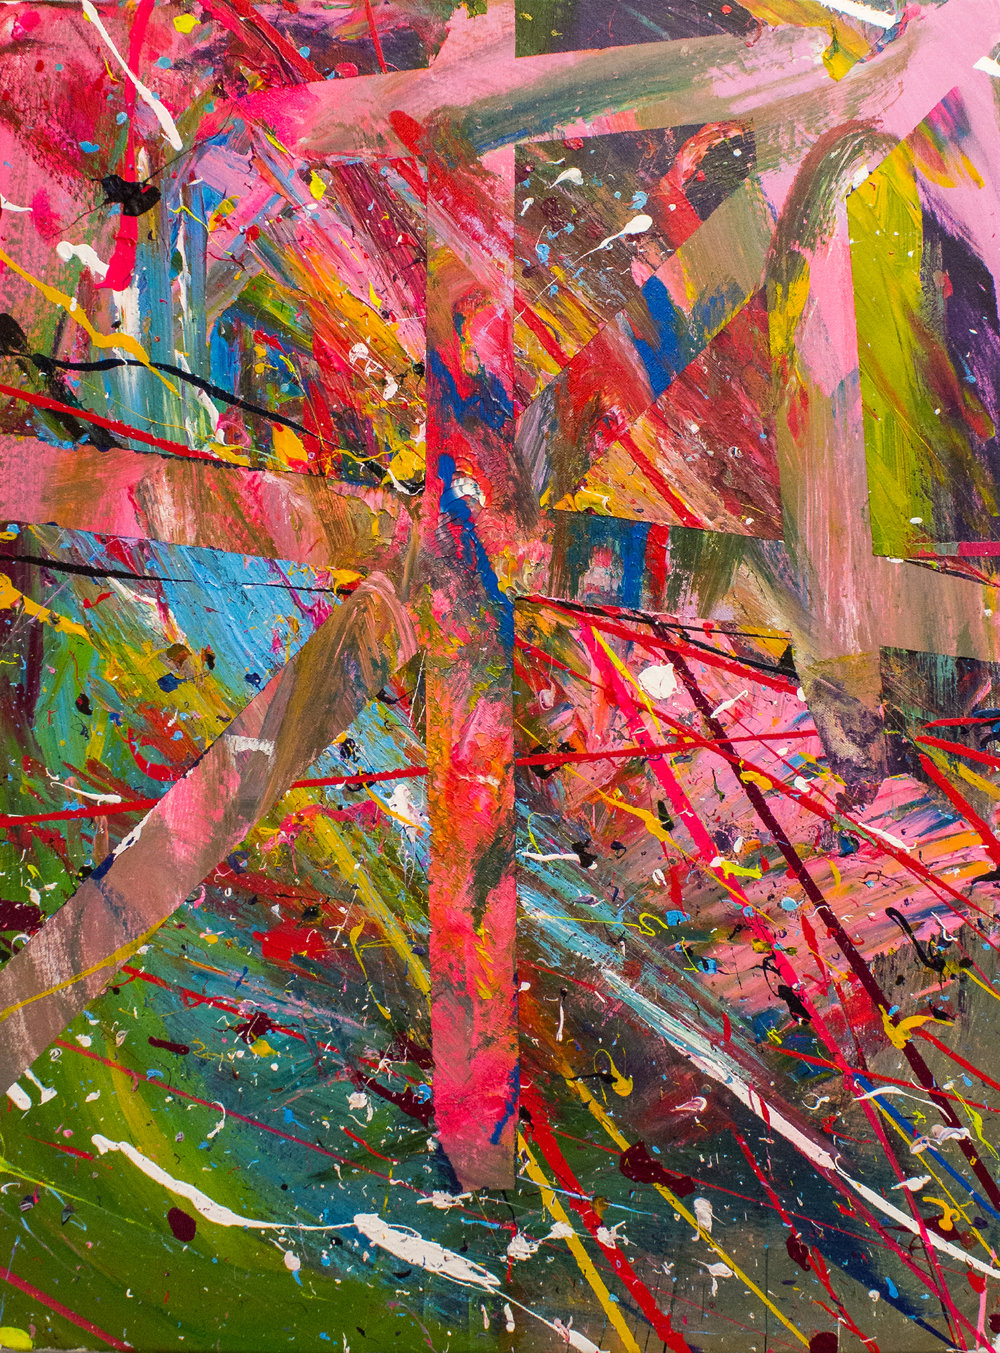 #16 / 60x80 on canvas